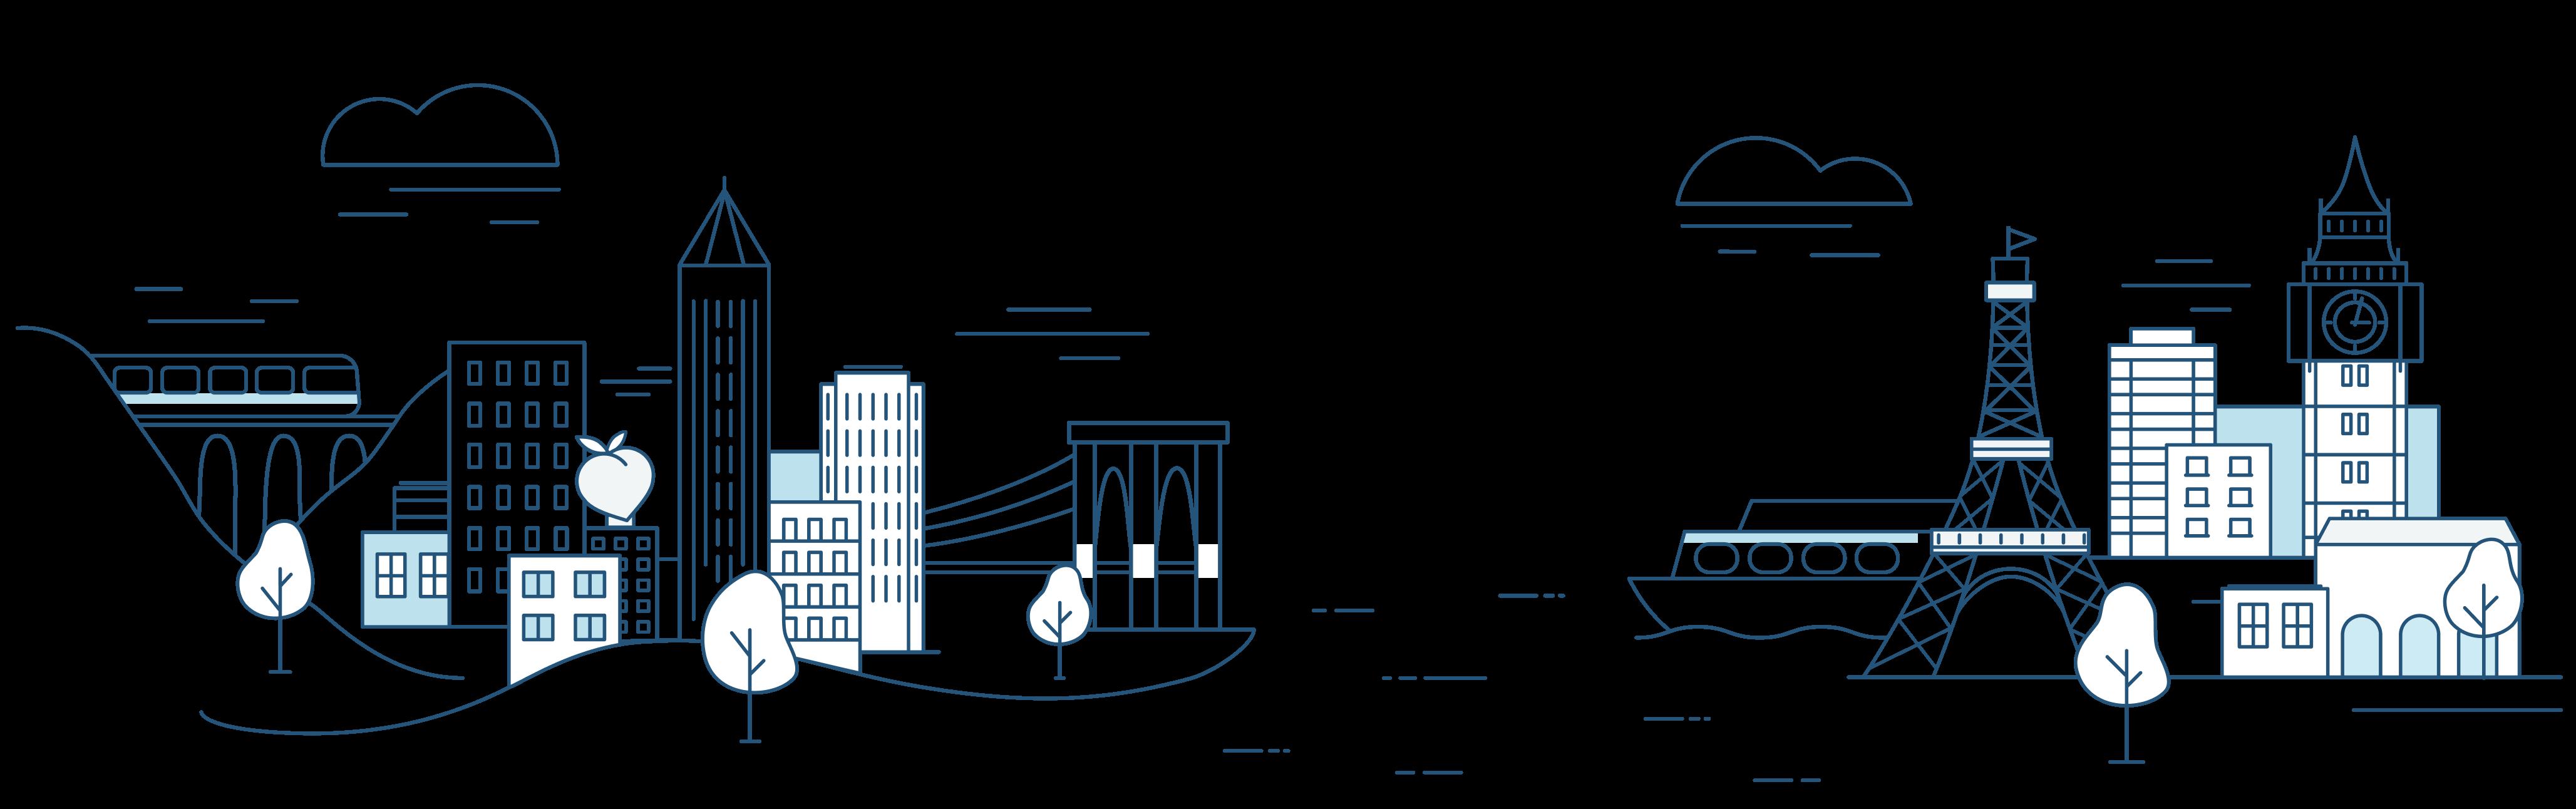 Illustration of landmarks around the world